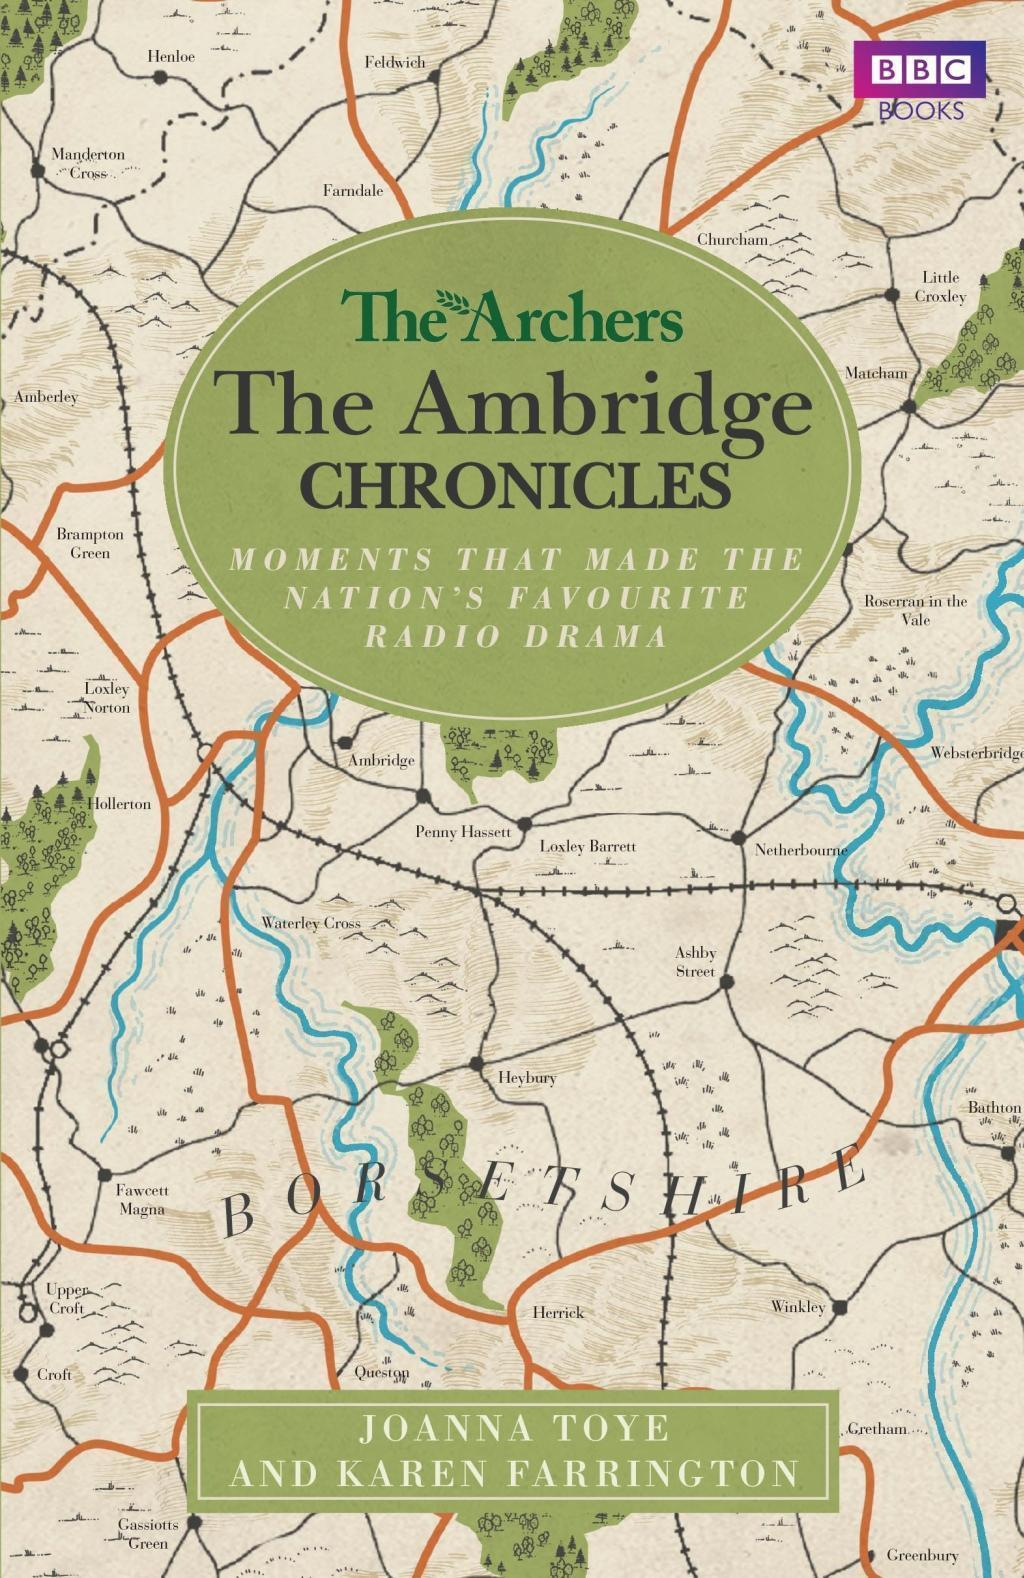 The Archers: The Ambridge Chronicles